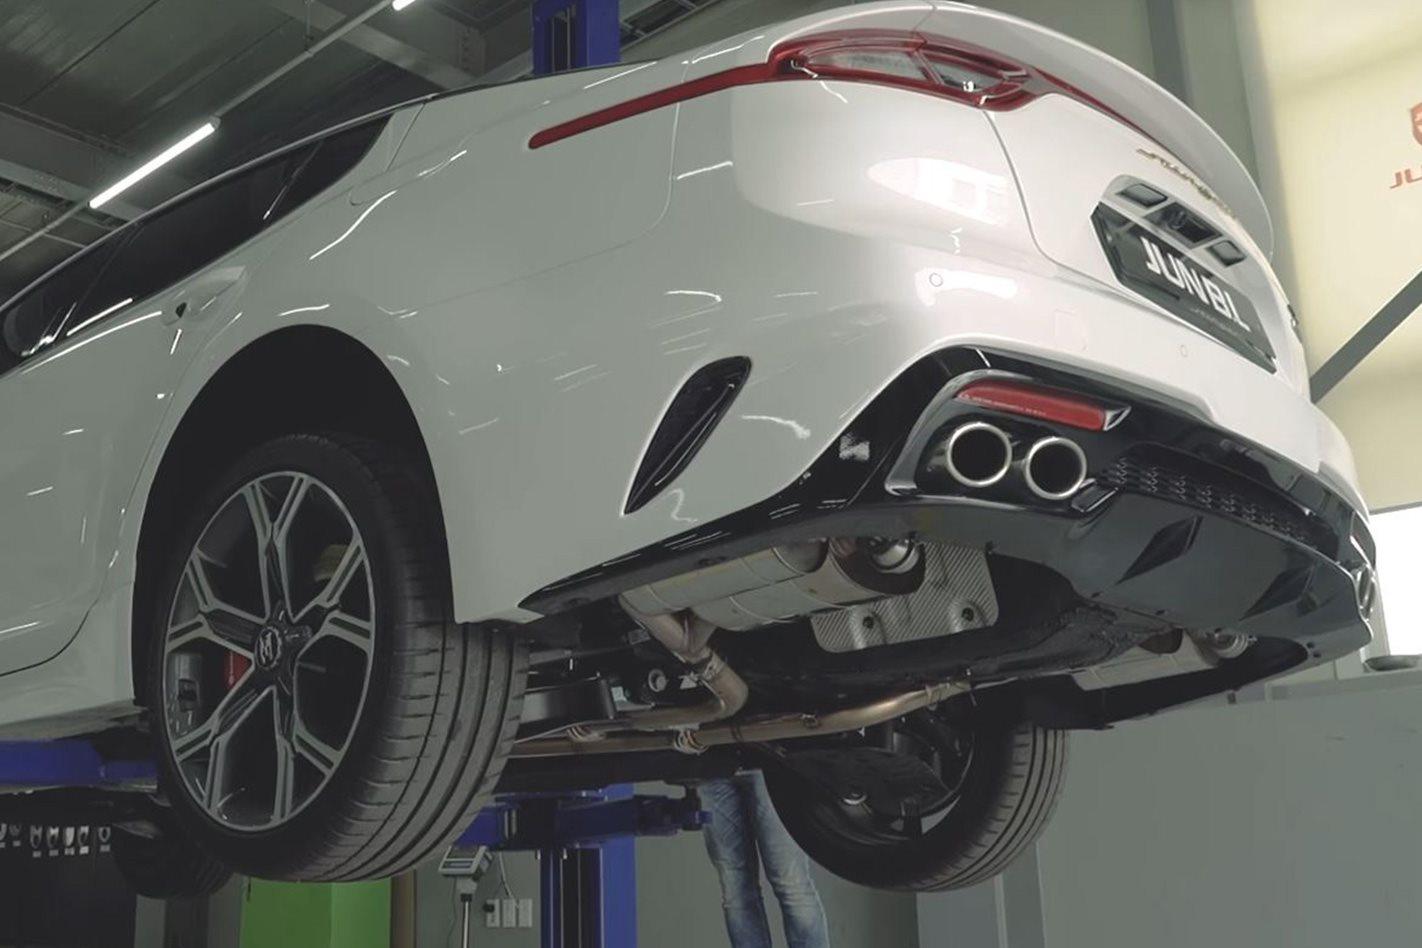 Kia Stinger GT at the mechanics